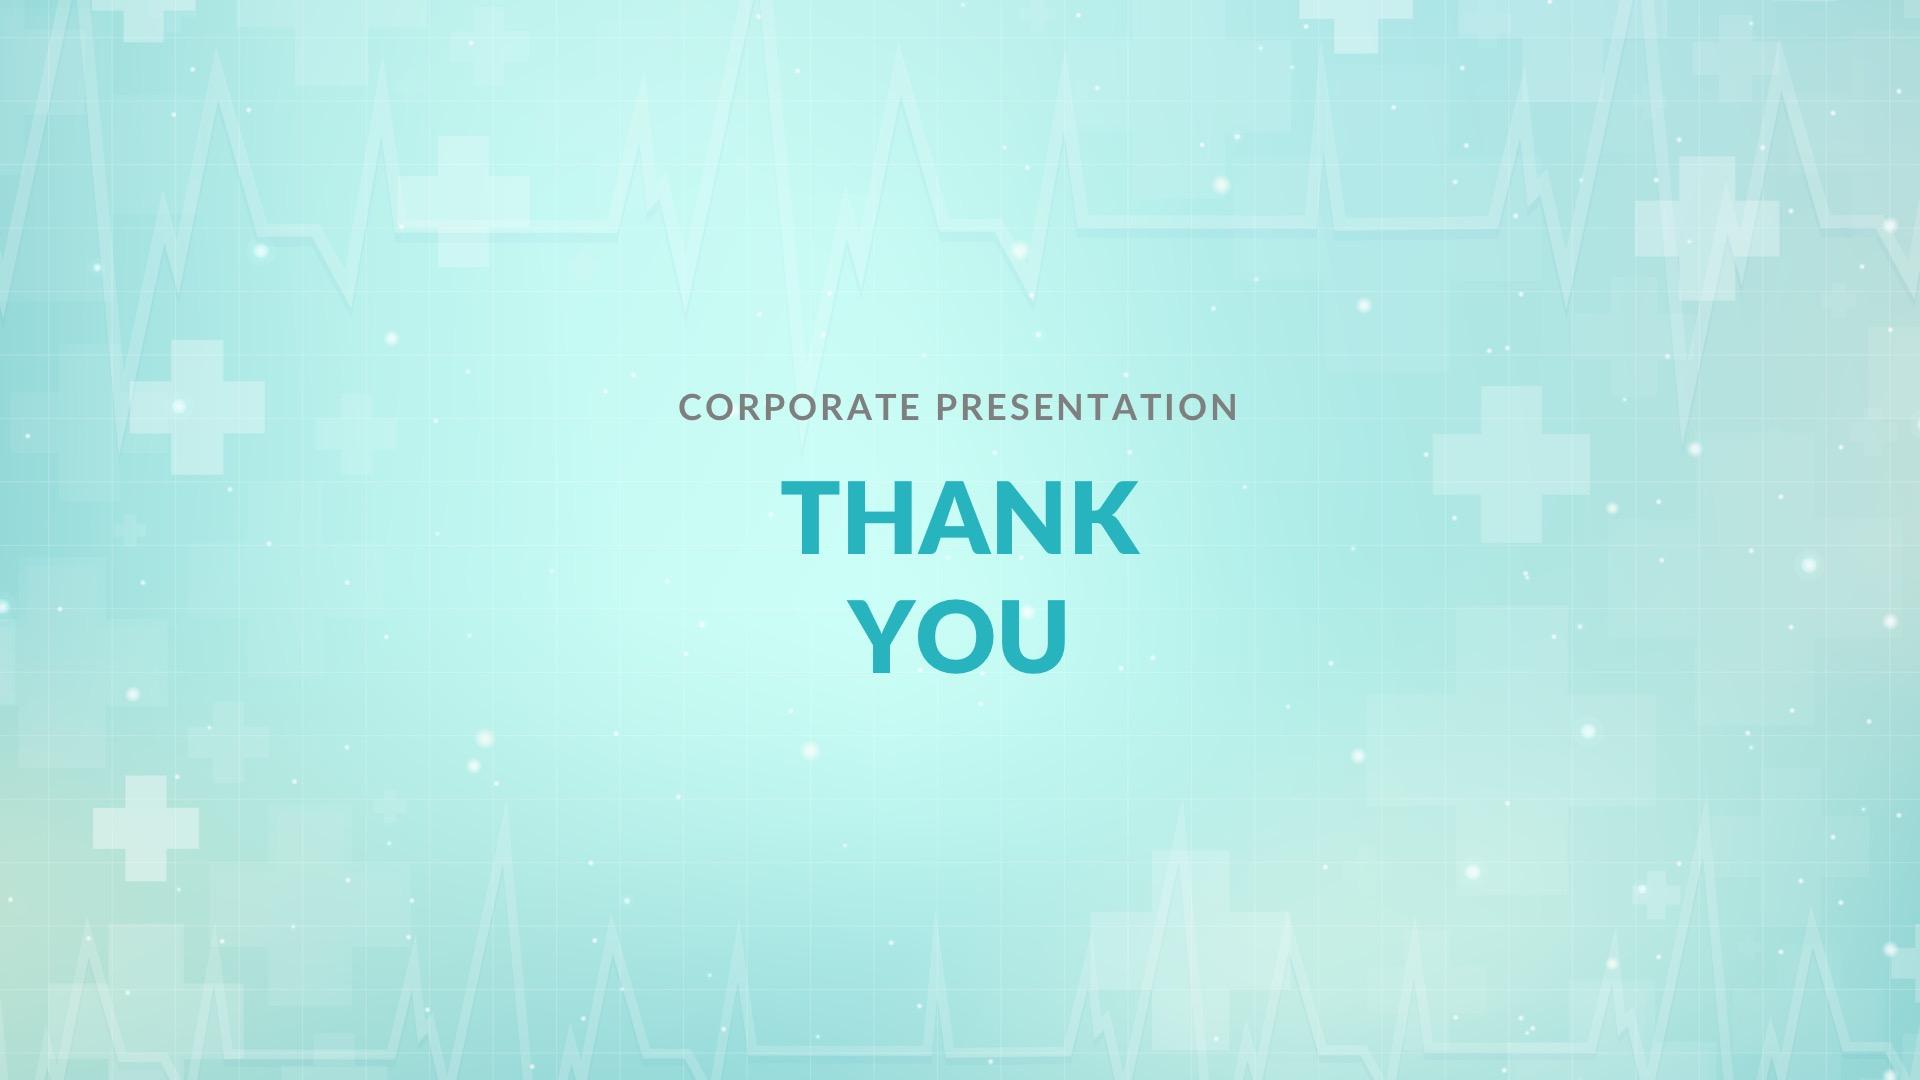 Hospital Medical PowerPoint Template, Google Slides, Keynote